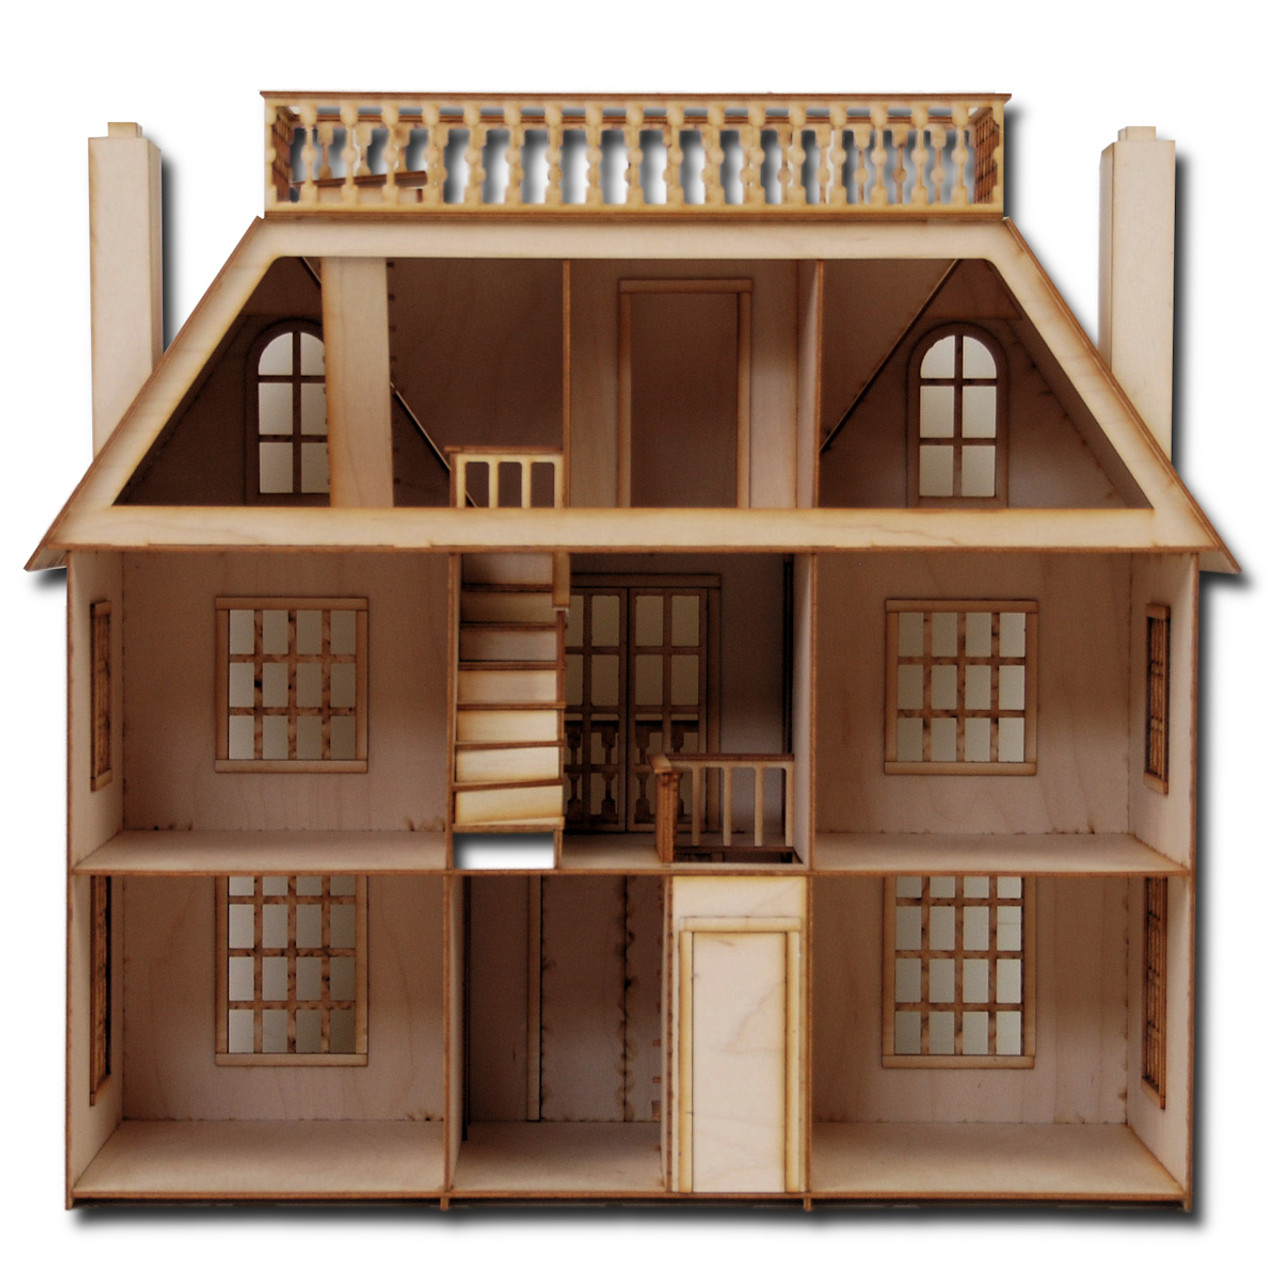 scale van buren dollhouse